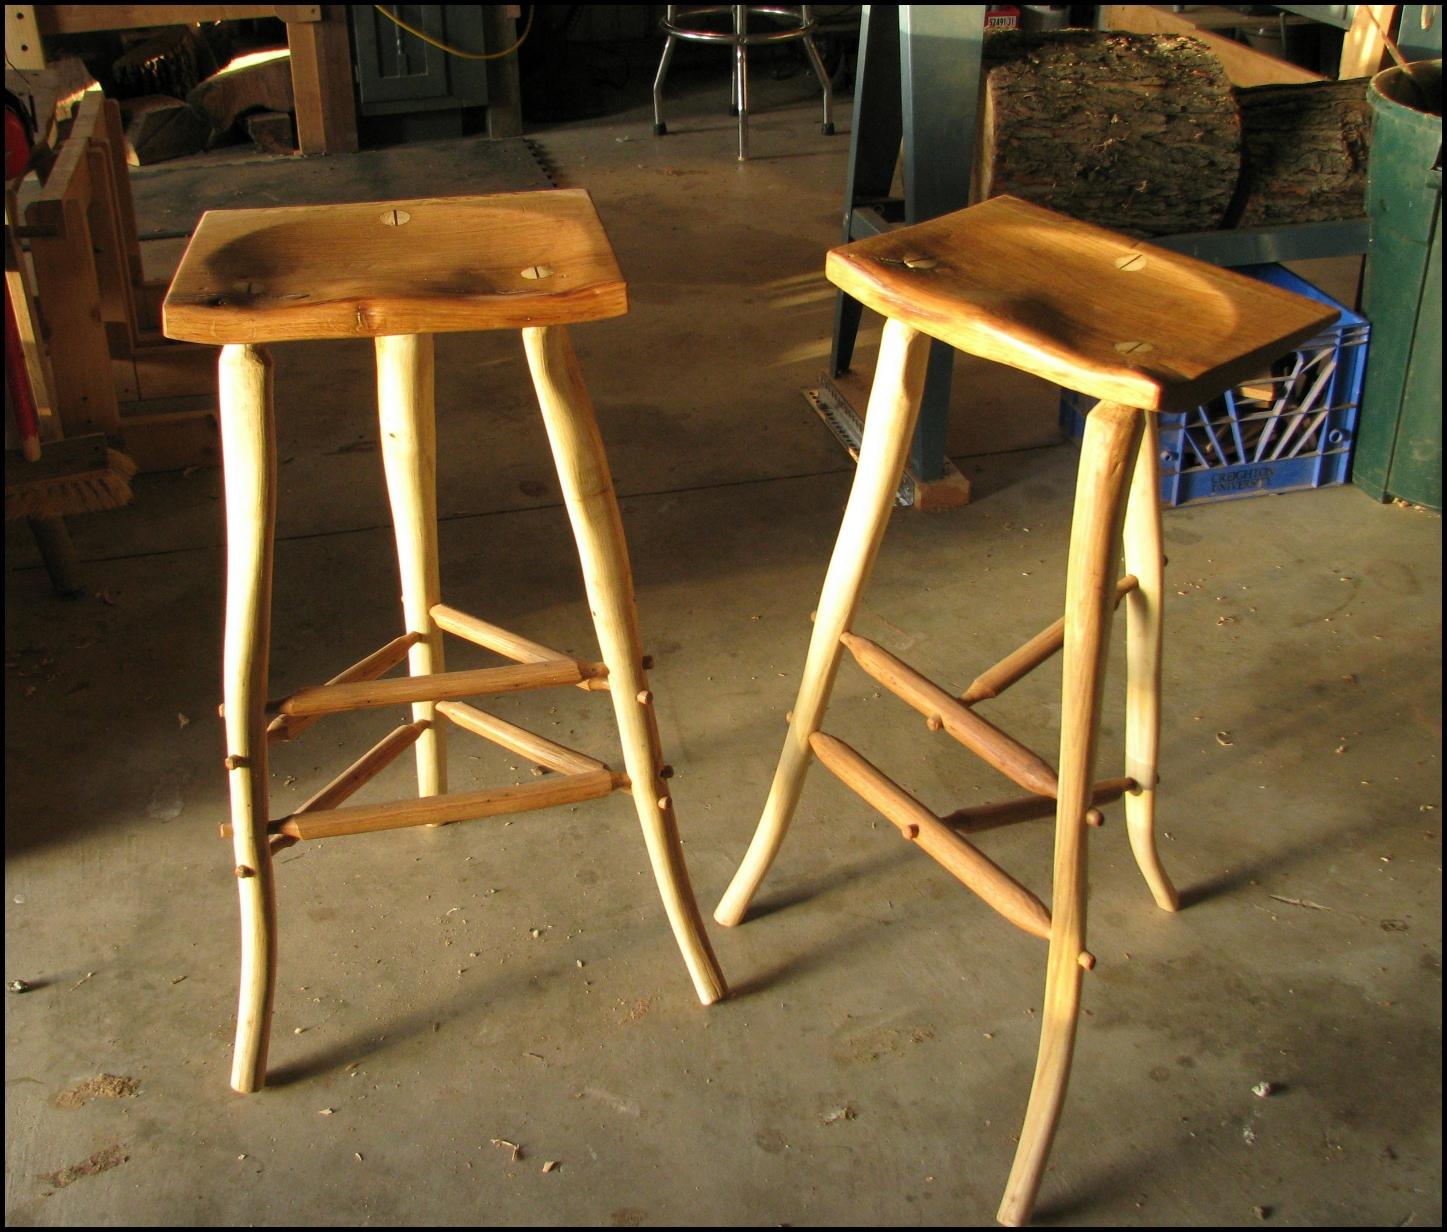 Sensational 3 Legged Stool Woodworking Plans Genuine Plan Beatyapartments Chair Design Images Beatyapartmentscom